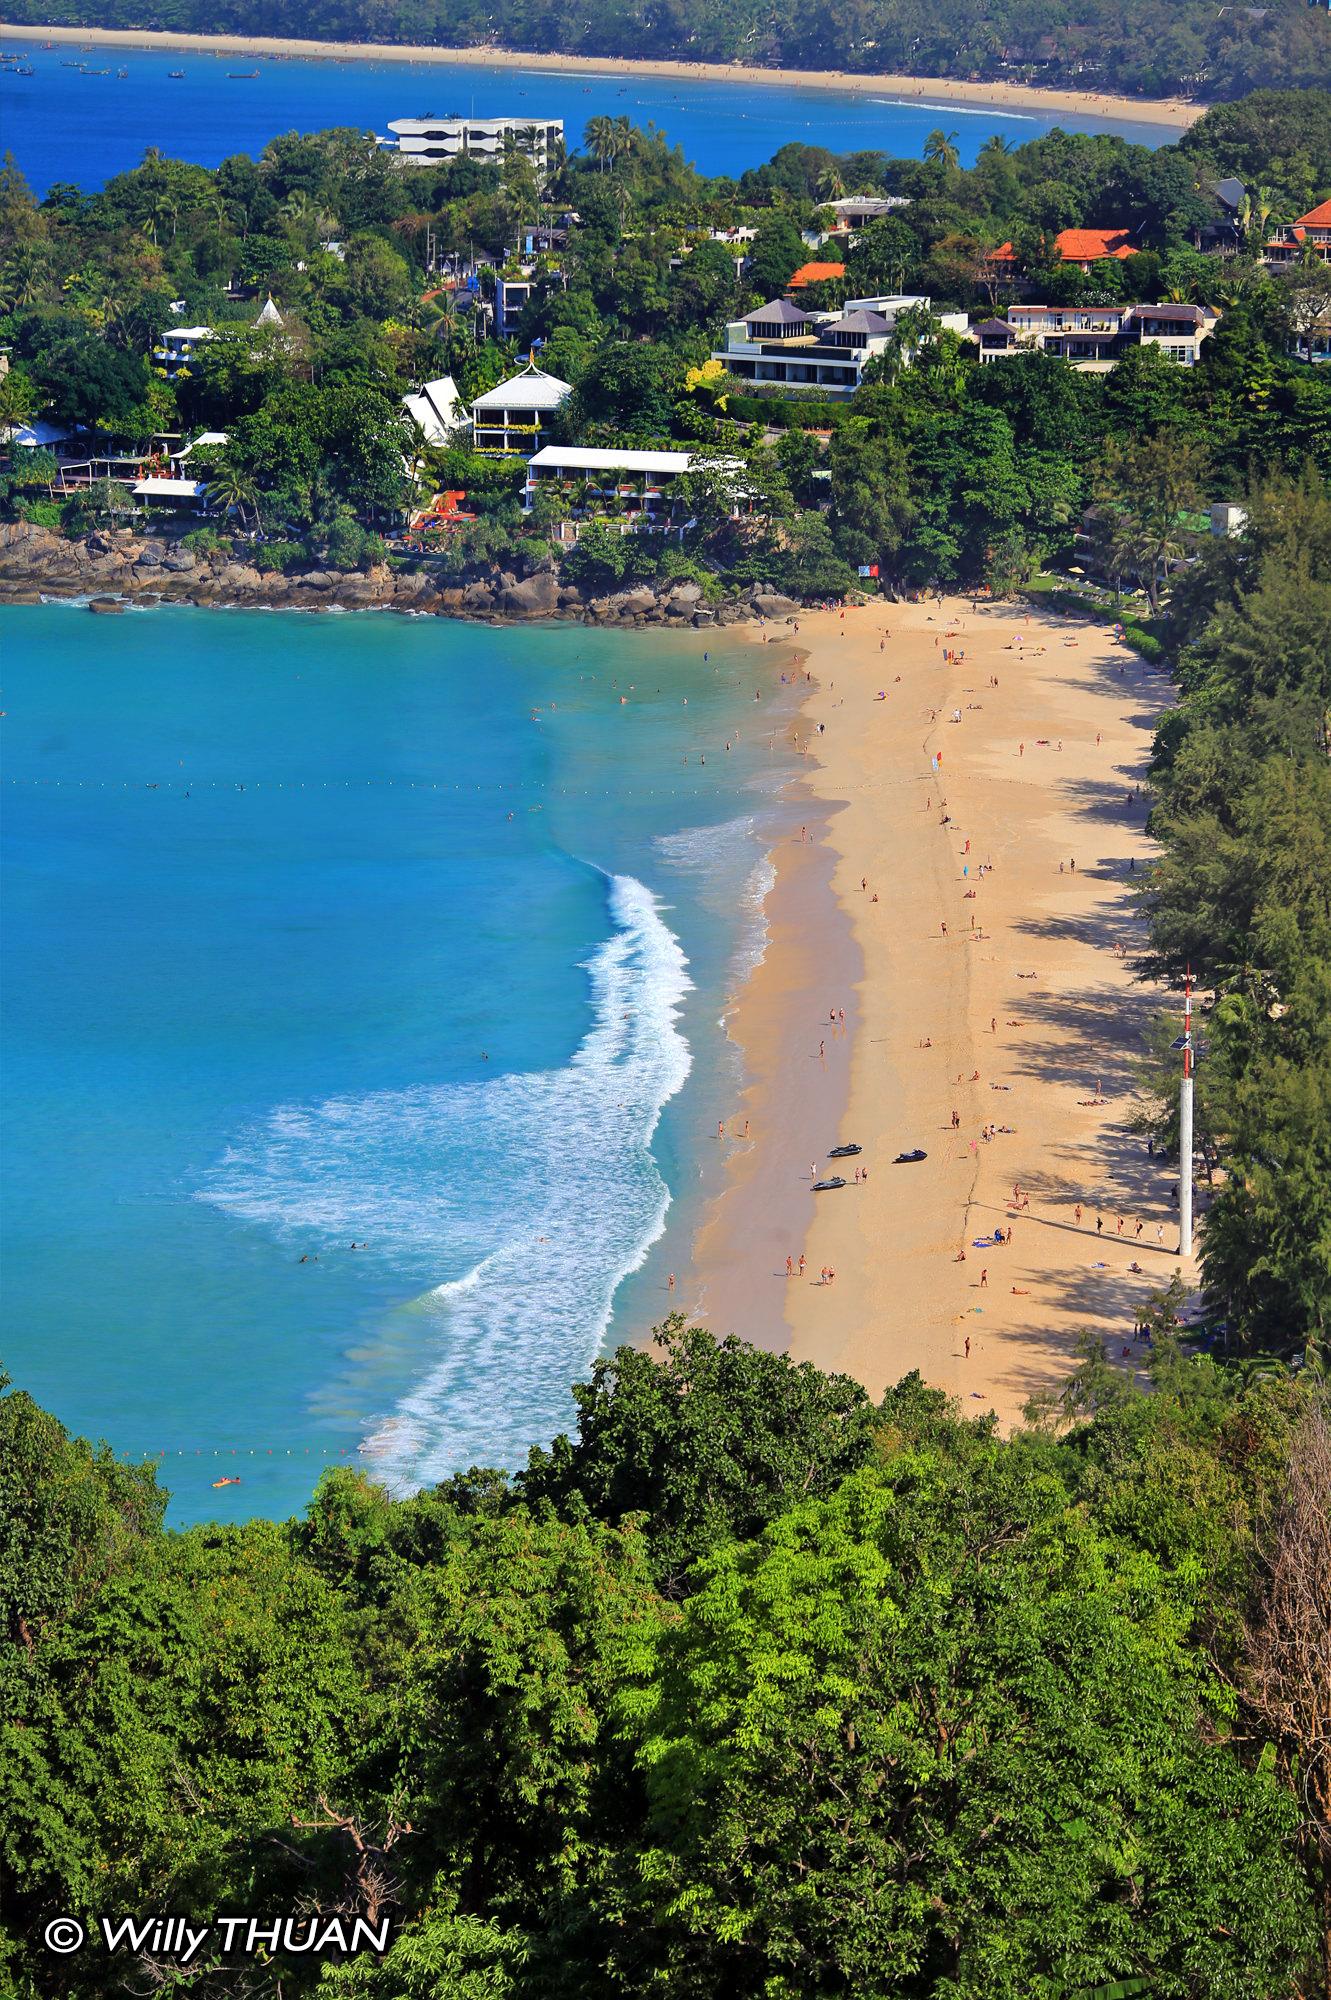 15 Best Viewpoints of Phuket (Updated) - PHUKET 101